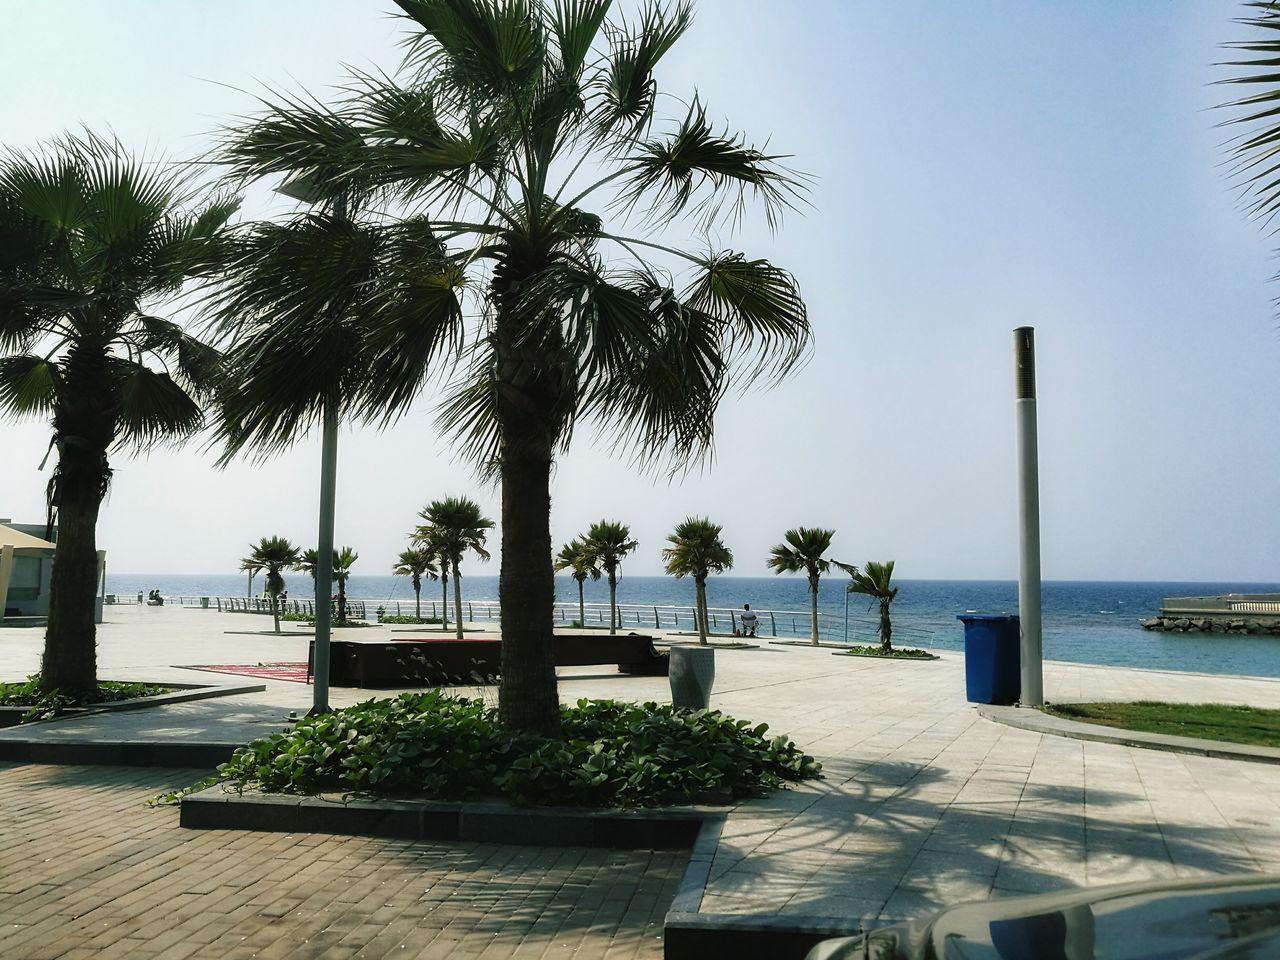 Palm Tree Sea Travel Beach Water Relaxation Summer Sunlight Vacations Tree Nature Sky Luxury First Eyeem Photo Jeddah Jeddah City Jeddah Beach Jeddah😍❤️ Jeddah Morning❤ Jeddah North Corniche || كورنيش جدة الشمالي KSA Ksa😍 Saudi Arabia